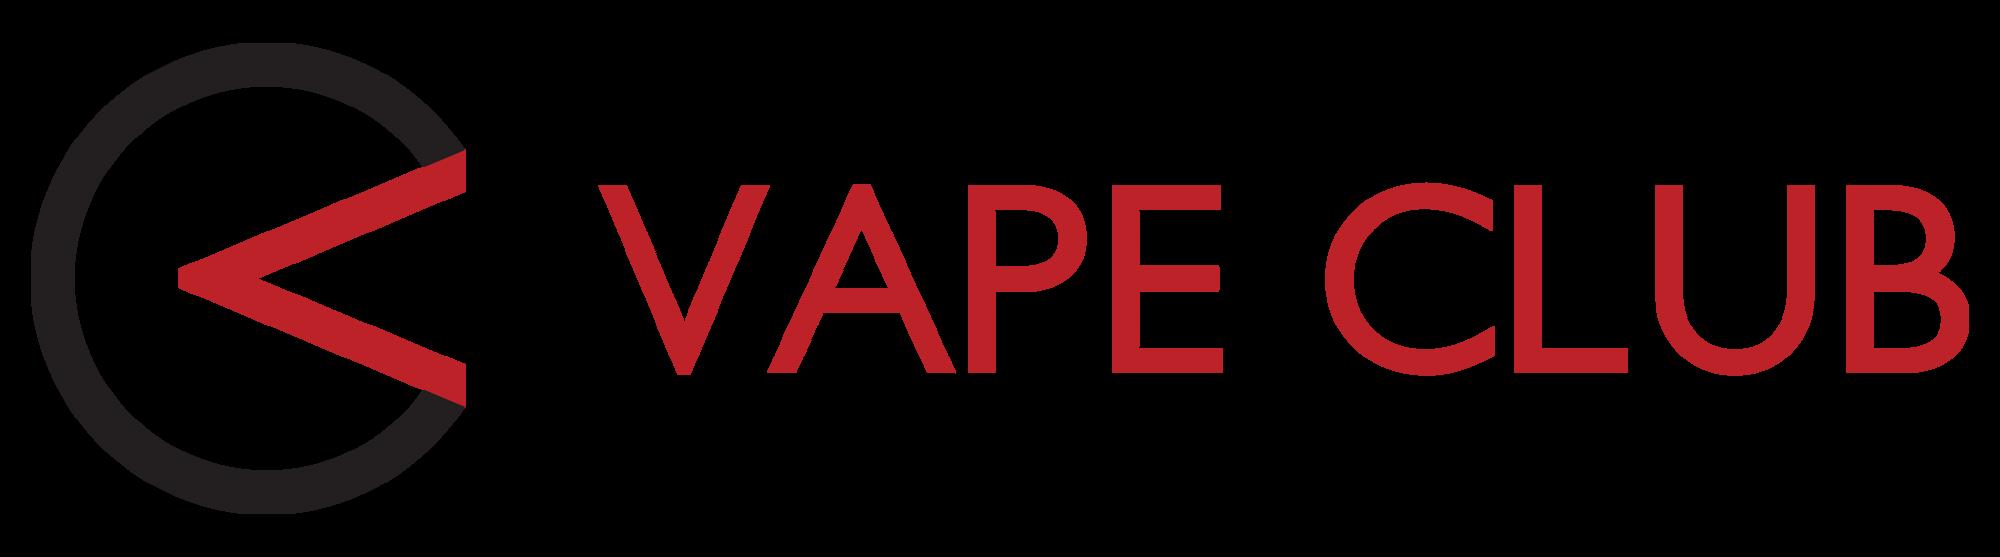 Vape Club Reviews | Read Customer Service Reviews of